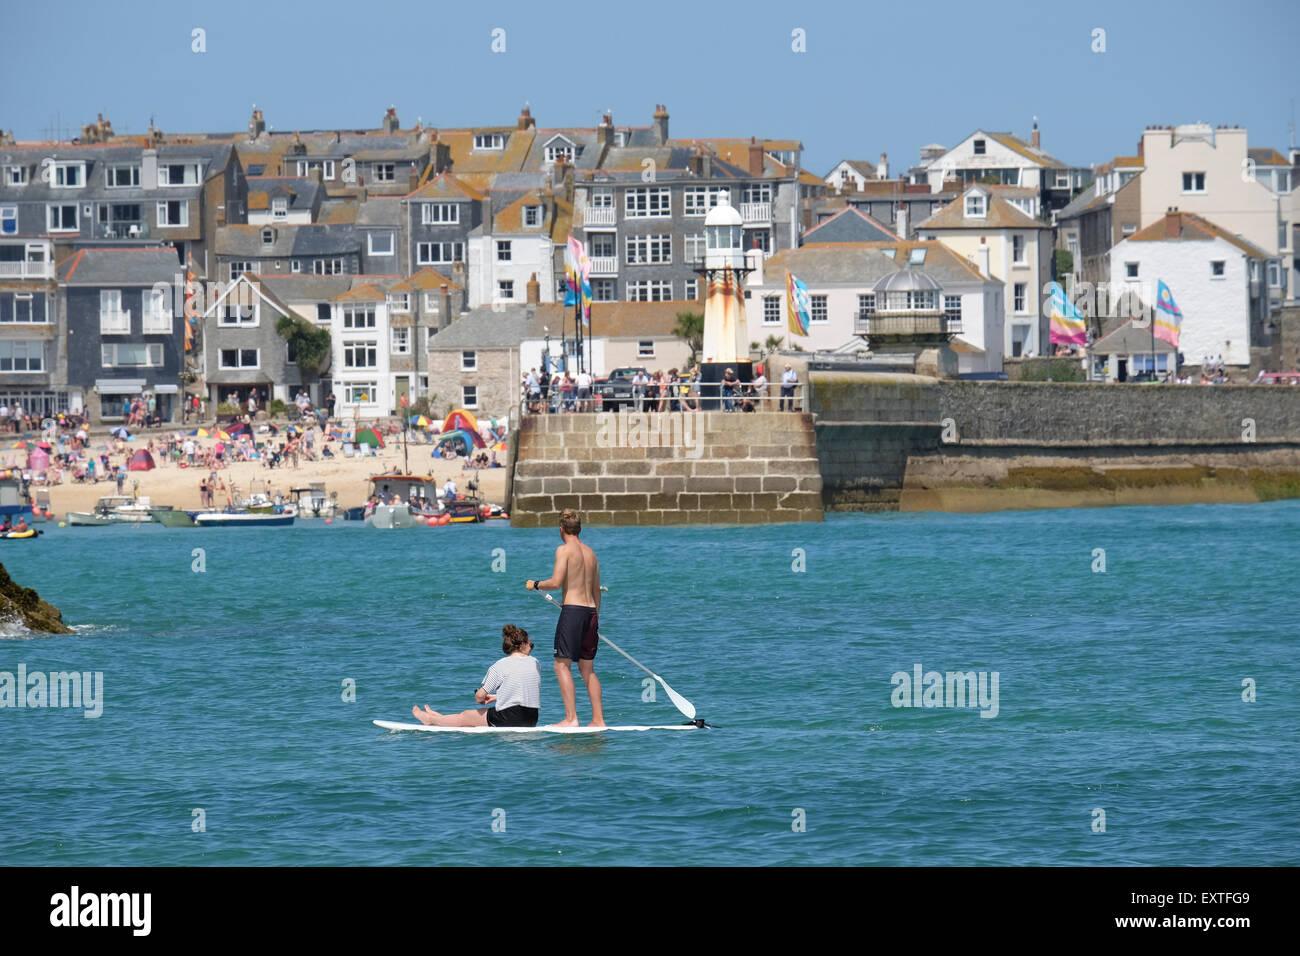 St Ives, Cornwall, Regno Unito: giovane su Paddleboard con St Ives in background. Immagini Stock